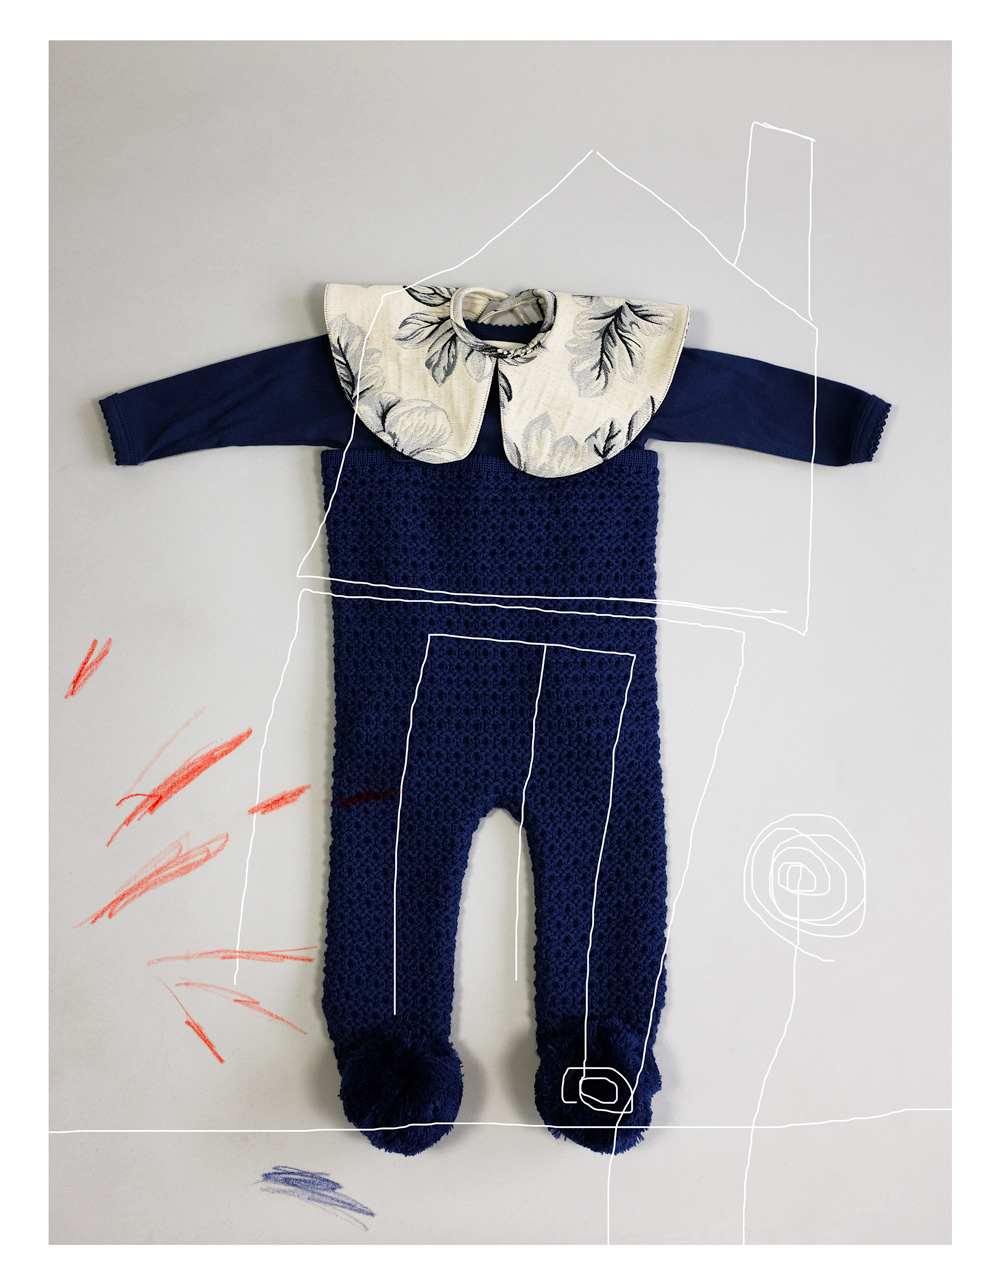 ●WOLF & RITA ウルフ&リタ 日本限定発売 EMANUEL -Feet Knit Leg 脚付きパンツ BLUE 6-12M